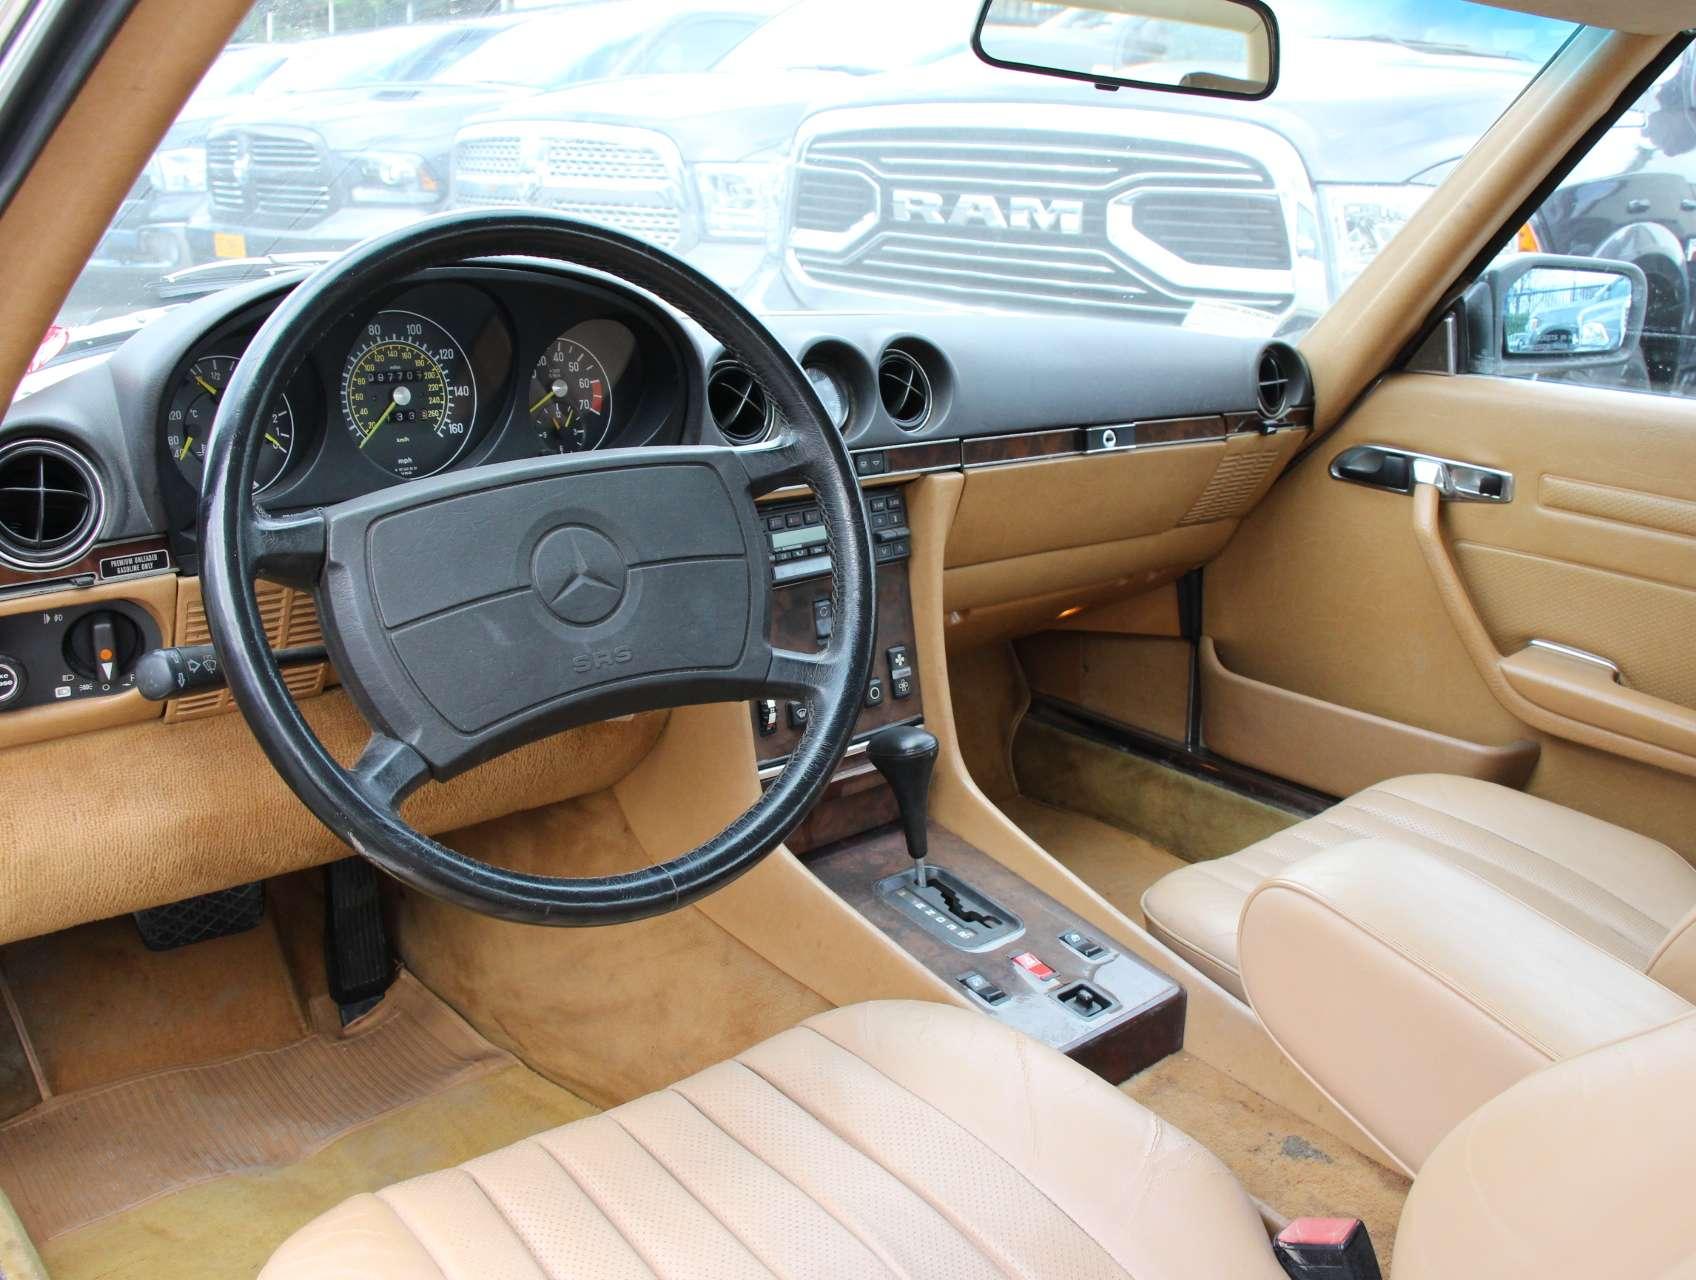 Tweedehands Mercedes-Benz SL 560 Cabriolet 1986 occasion